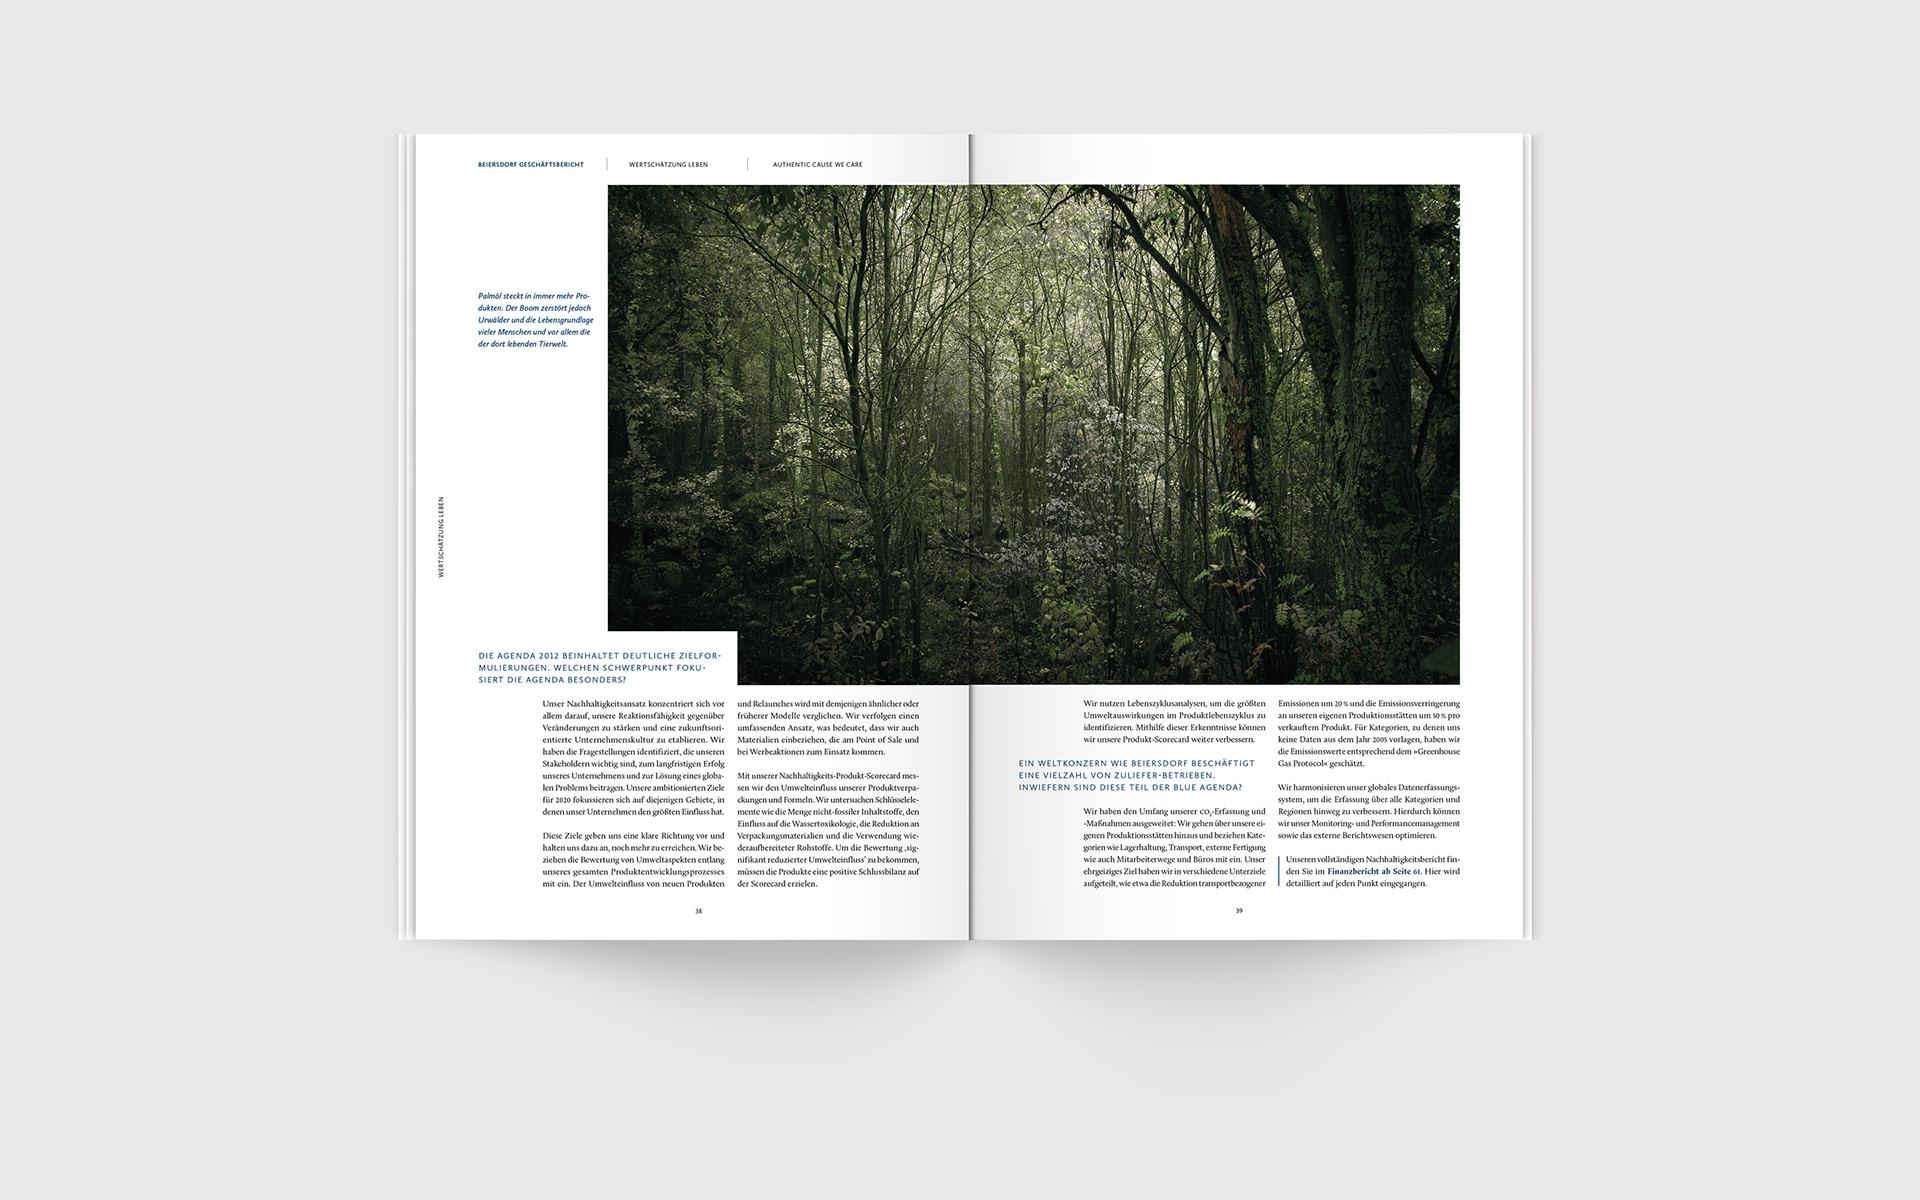 Stefan Große Halbuer - Beiersdorf Annual Report – Case Study